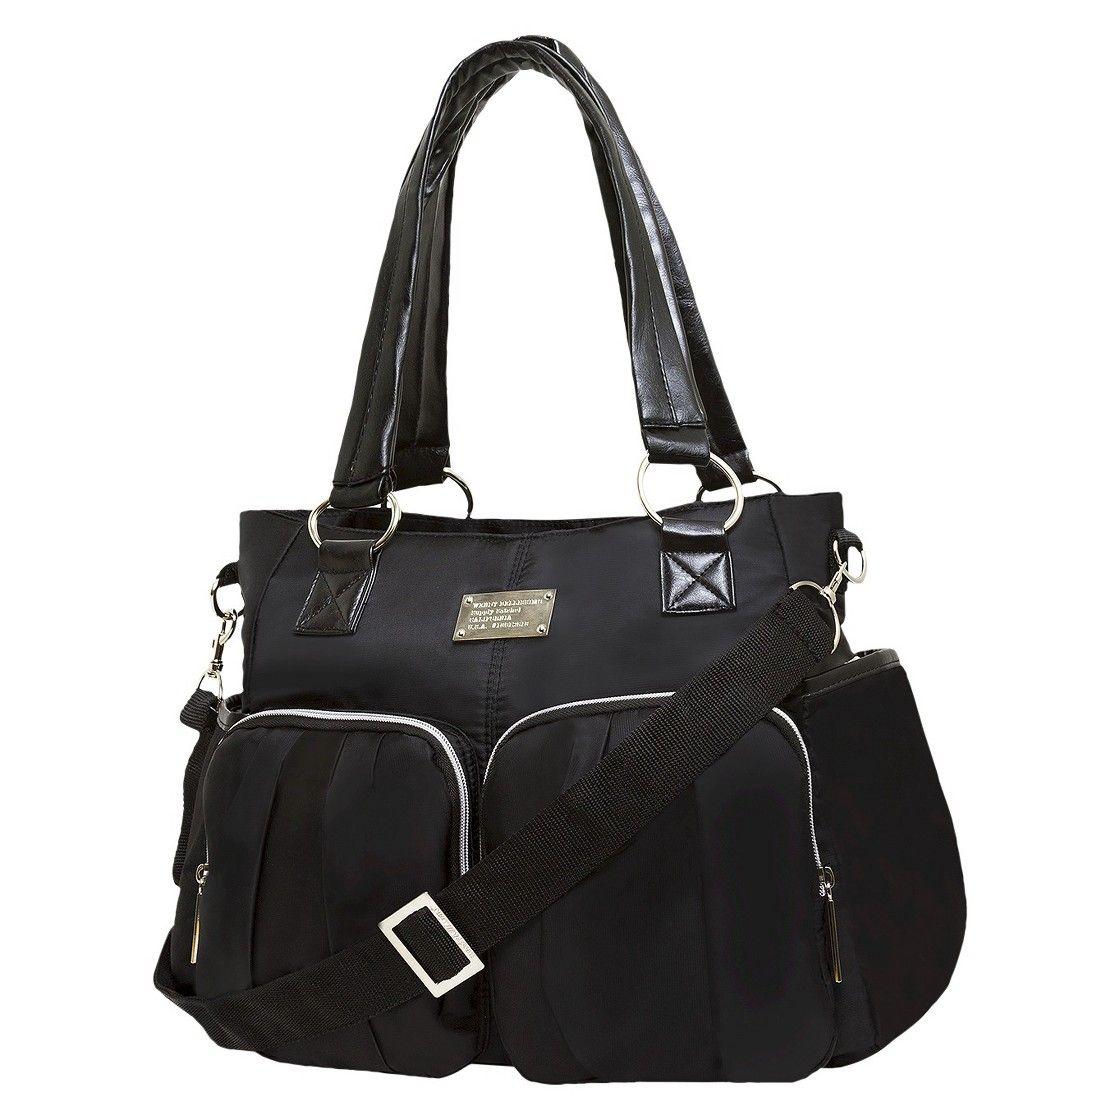 c3b9e113eabe Wendy Bellissimo Shirred Pocket Tote Diaper Bag - Black